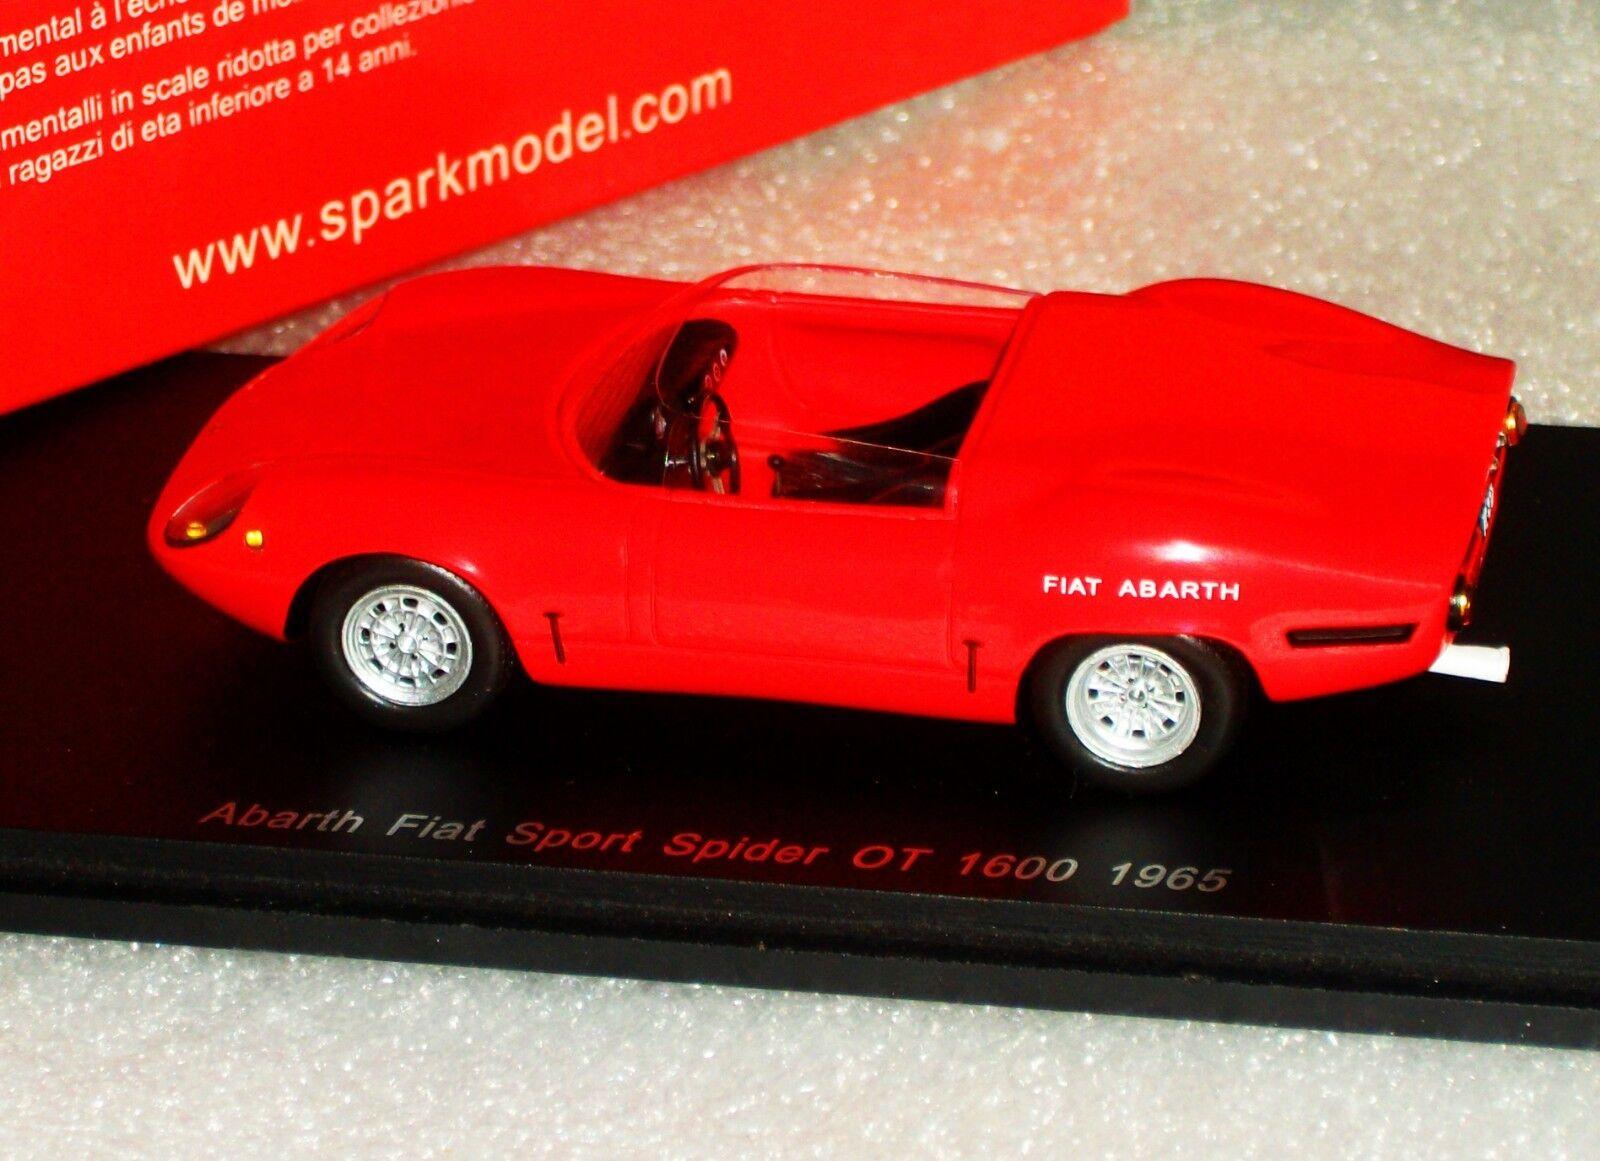 Fiat Abarth Sport Araña OT 1600 1965 Spark S1319 1 43